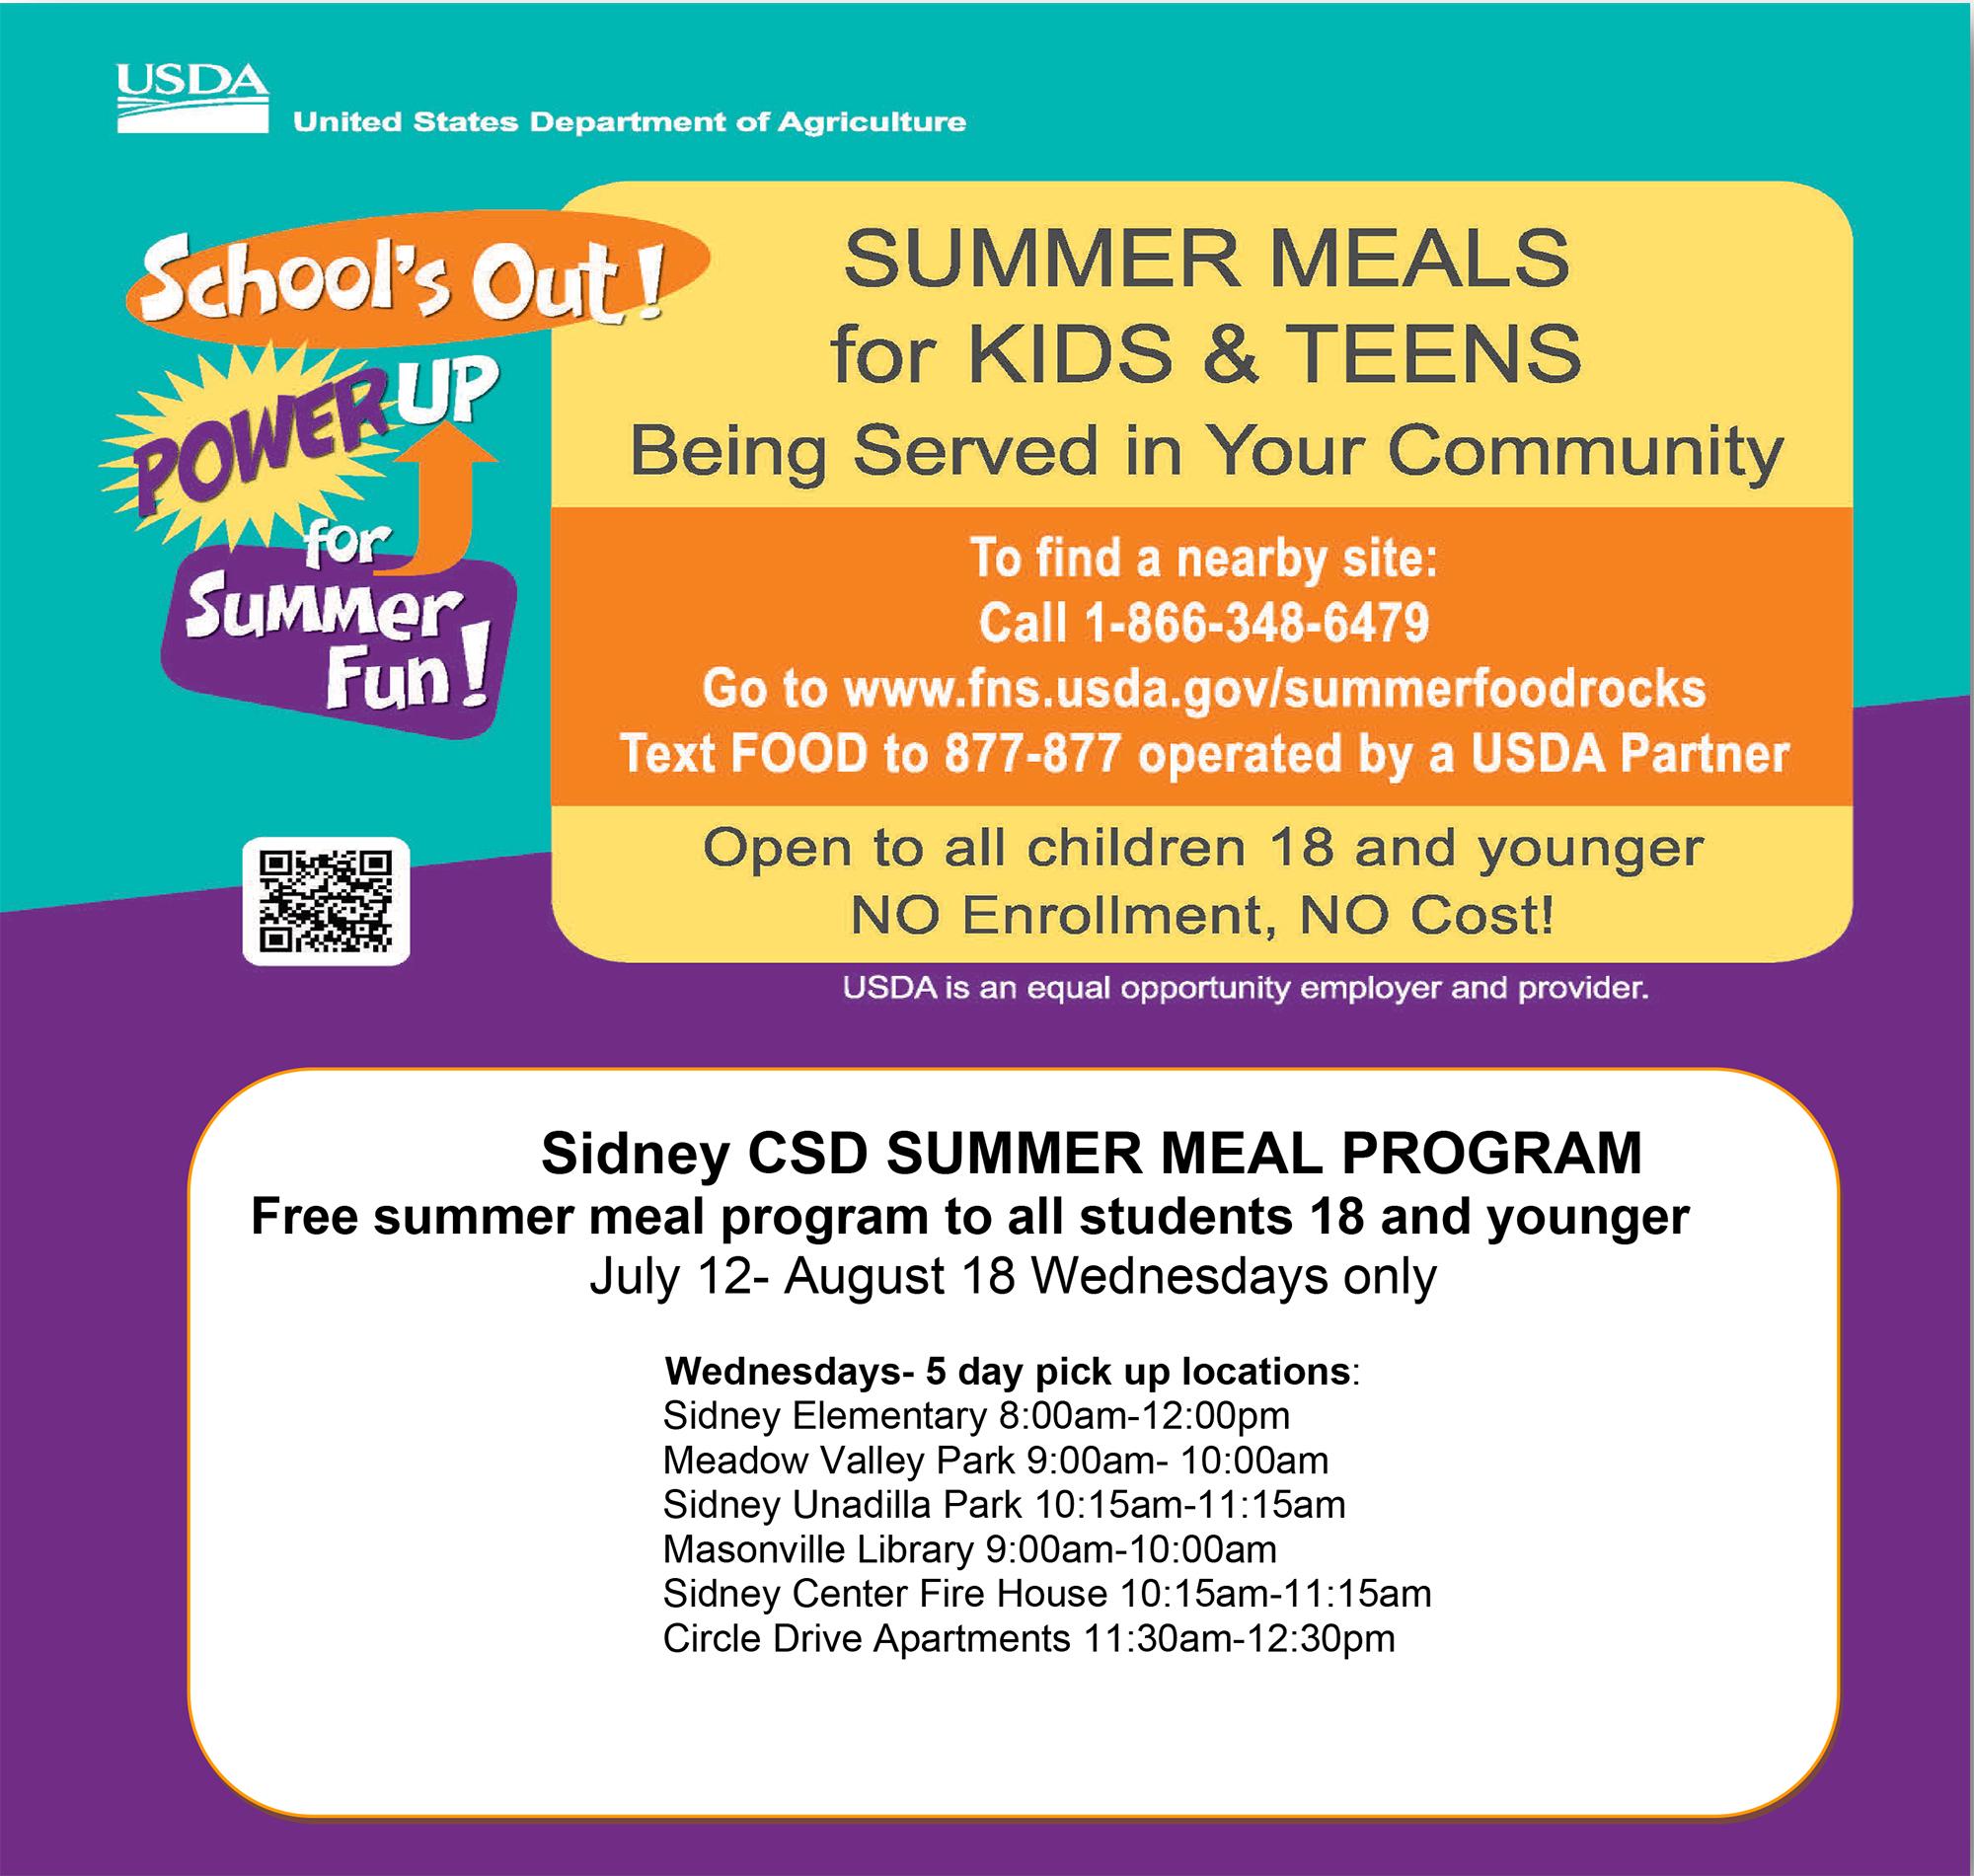 Summer meal program info